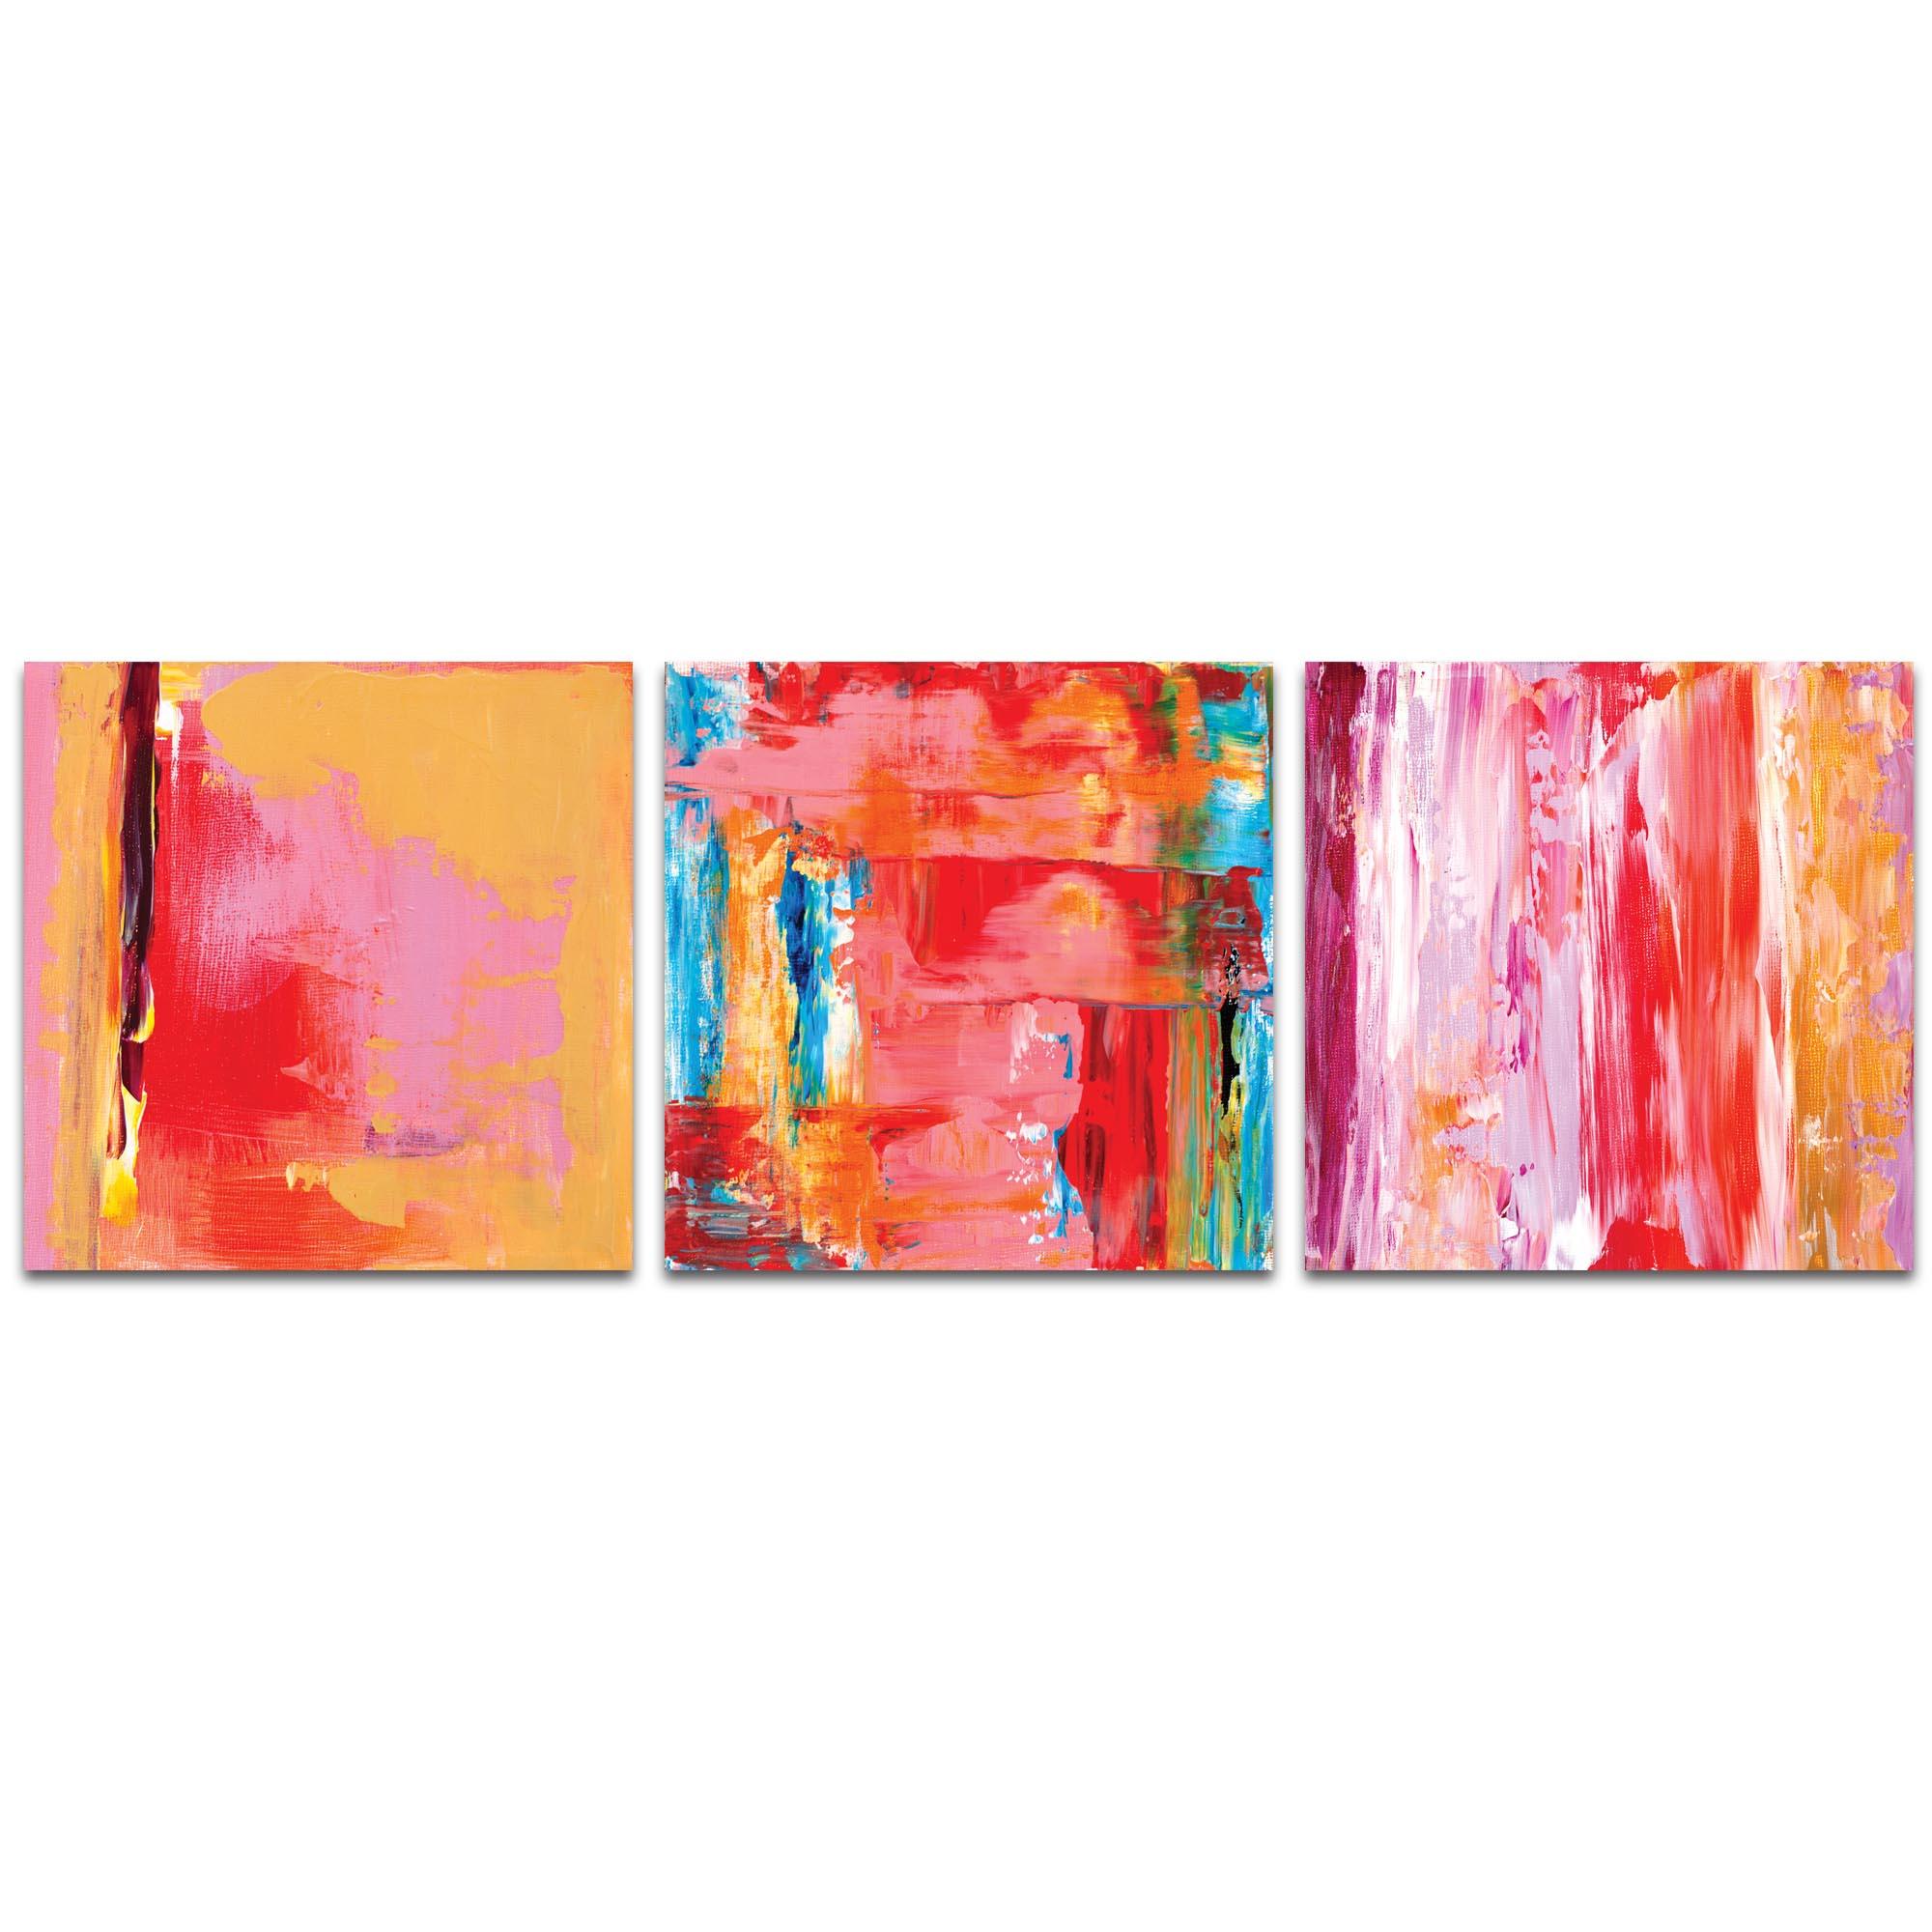 Abstract Wall Art 'Urban Triptych 3' - Urban Decor on Metal or Plexiglass